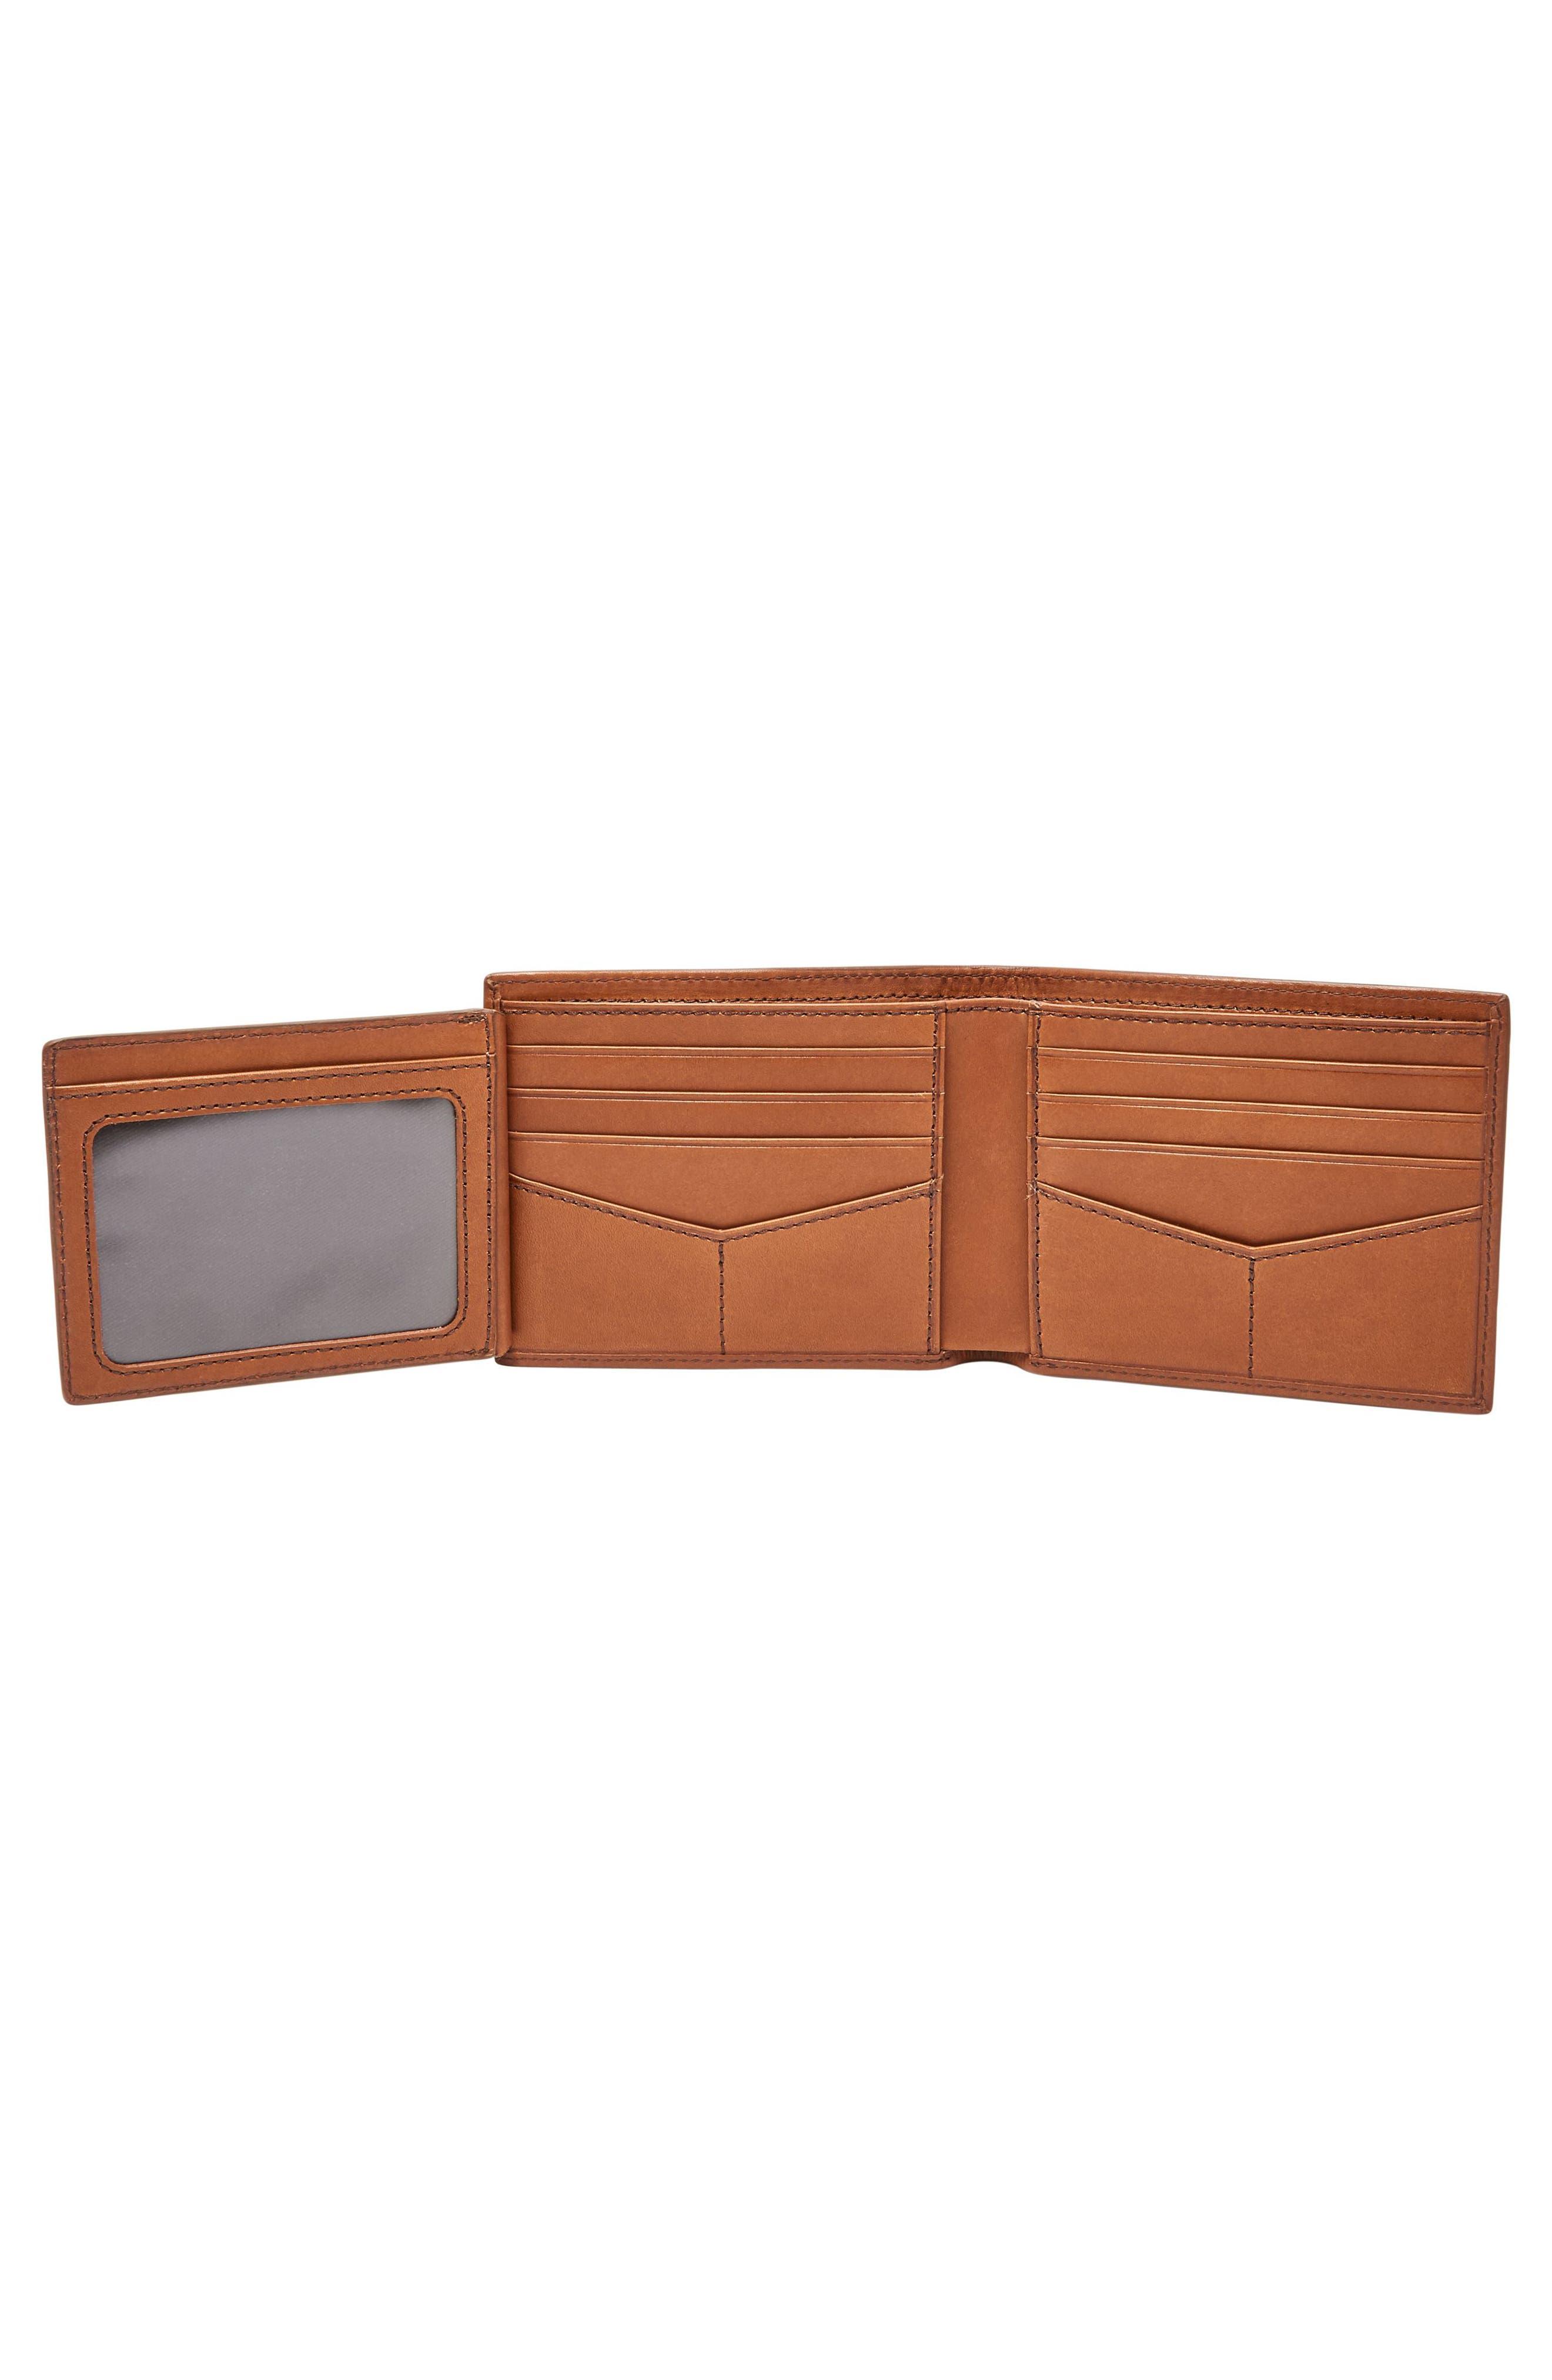 Paul Leather Wallet,                             Alternate thumbnail 3, color,                             222